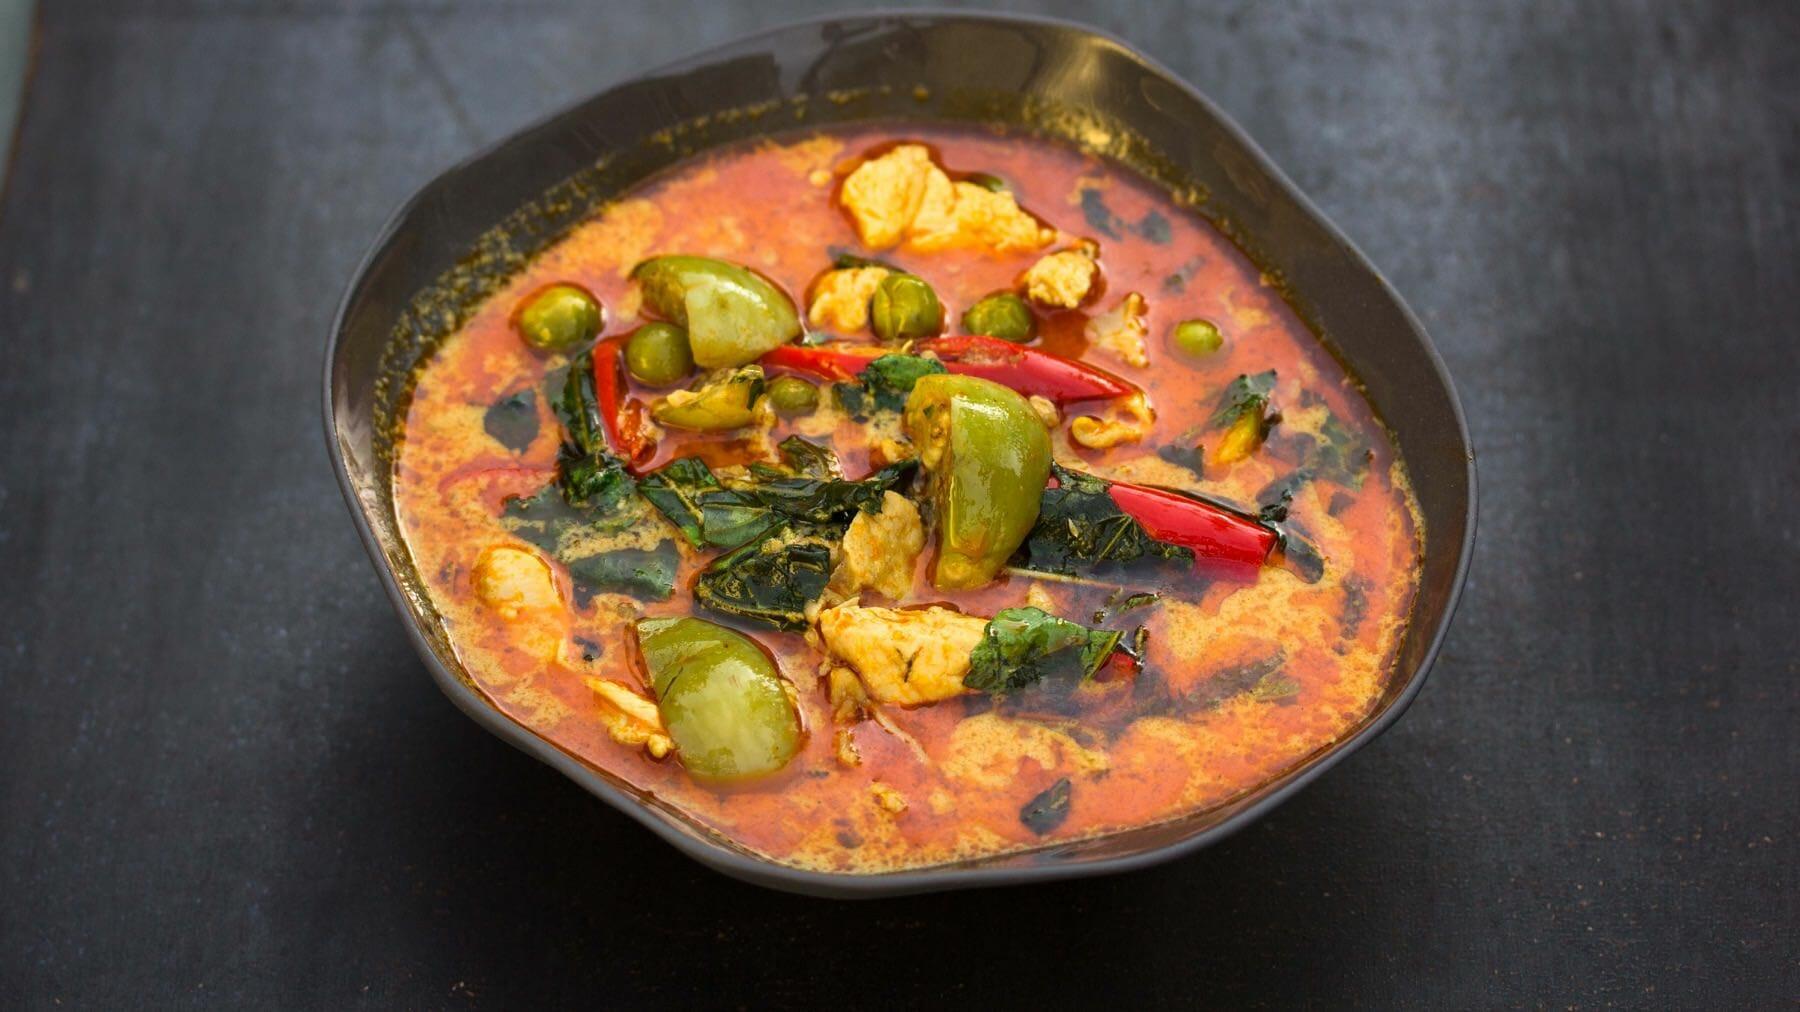 Rotes Thai-Curry mit Huhn - Gaeng Phed Gai